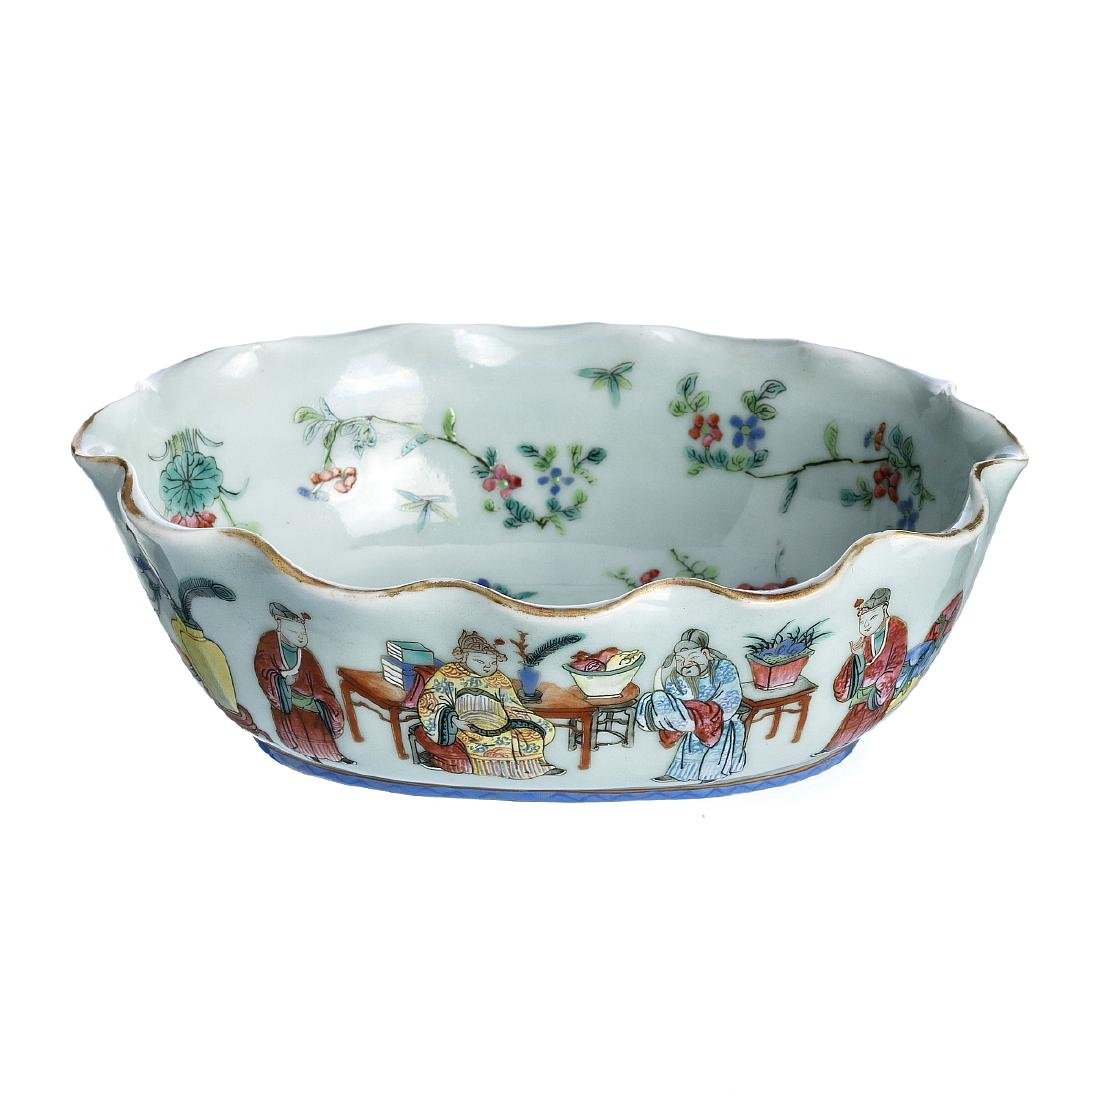 Oval bowl in chinese porcelain celadon, Tongzhi